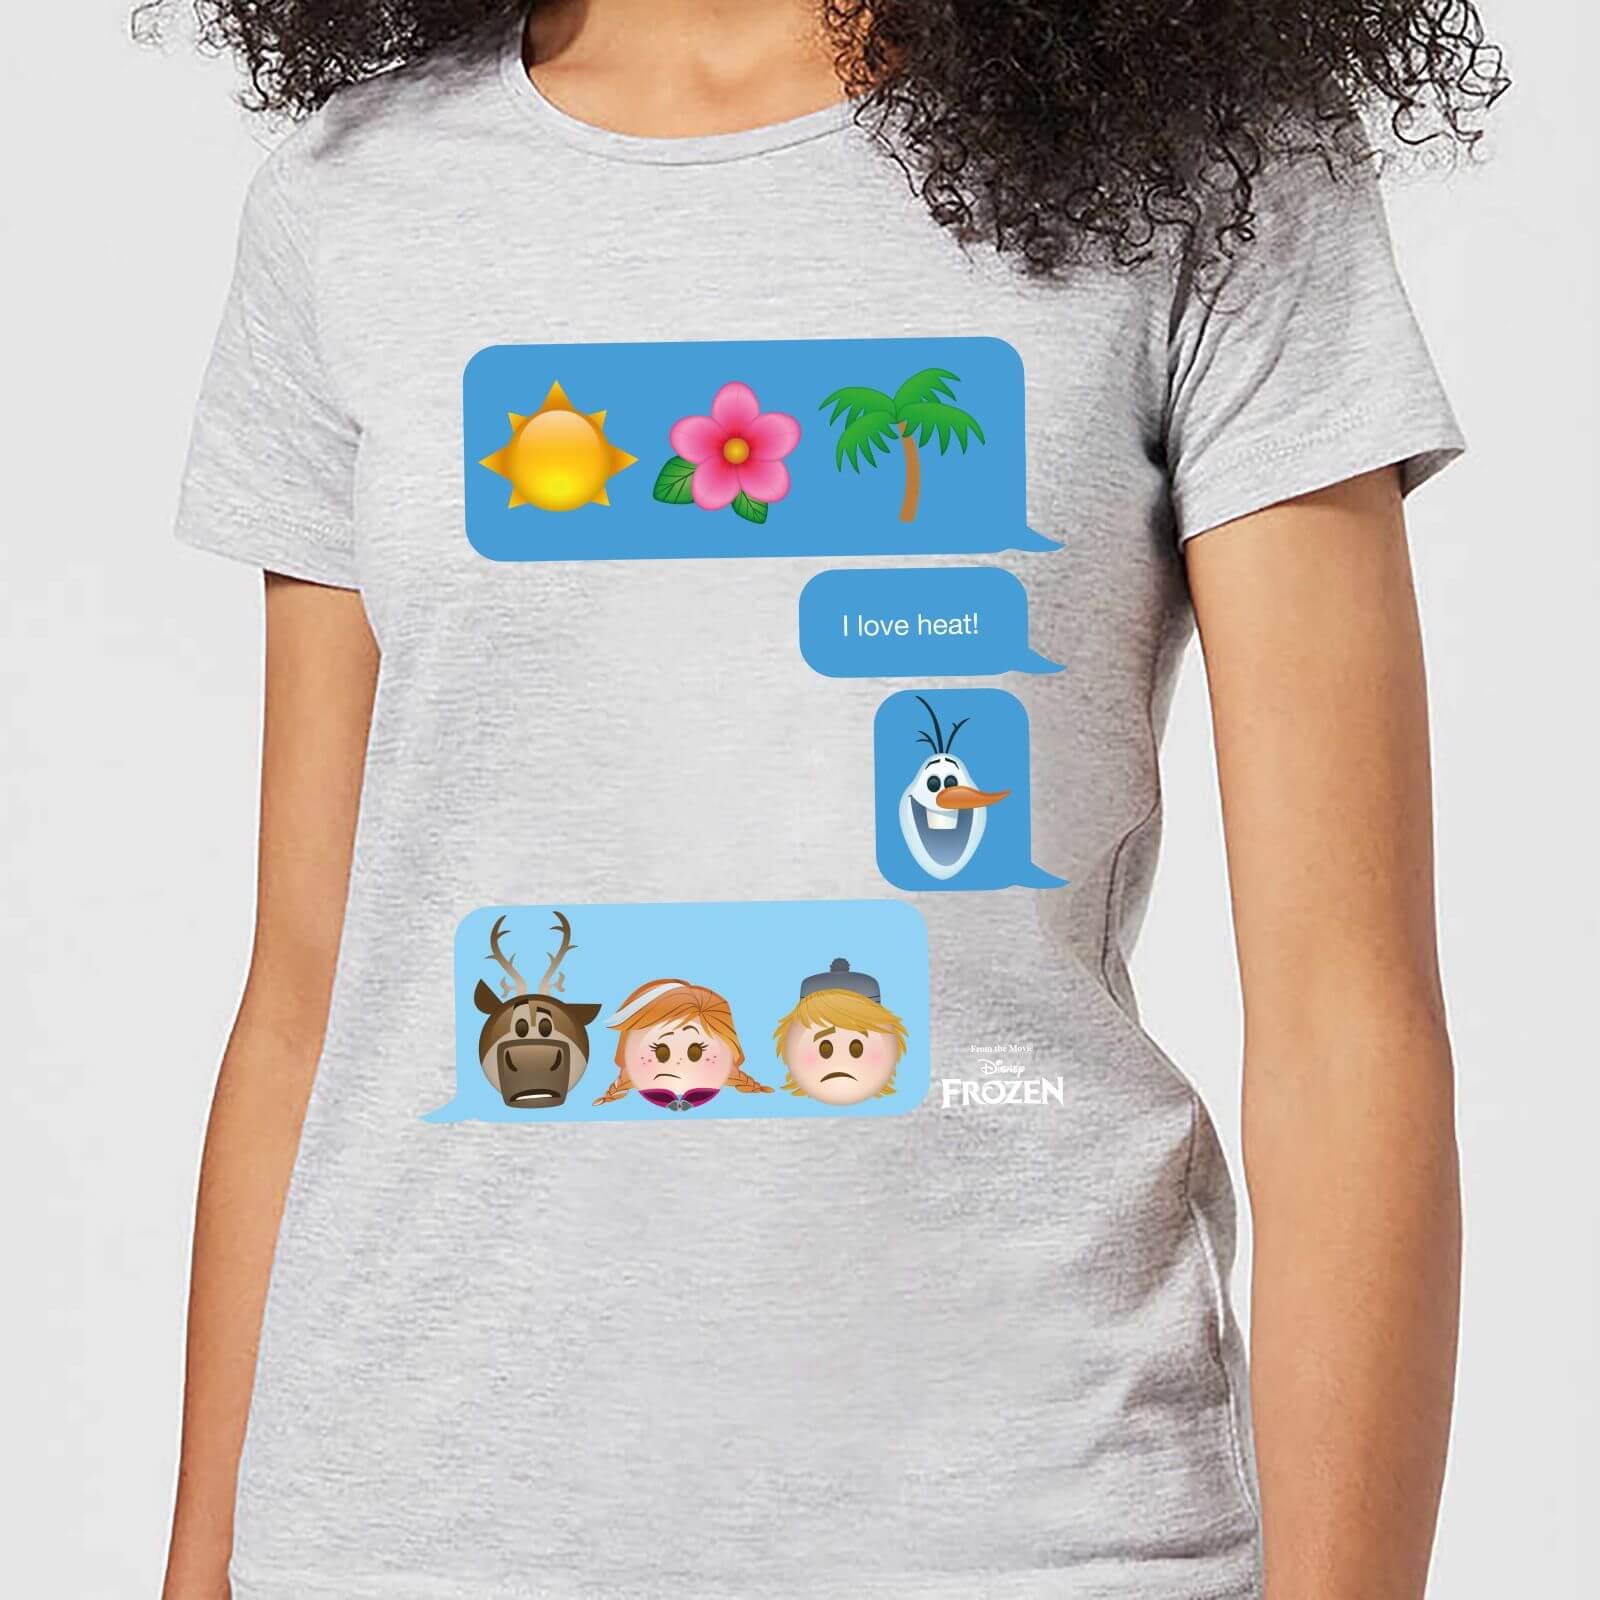 Disney Frozen I Love Heat Emoji Women's T-Shirt - Grey - M - Grey